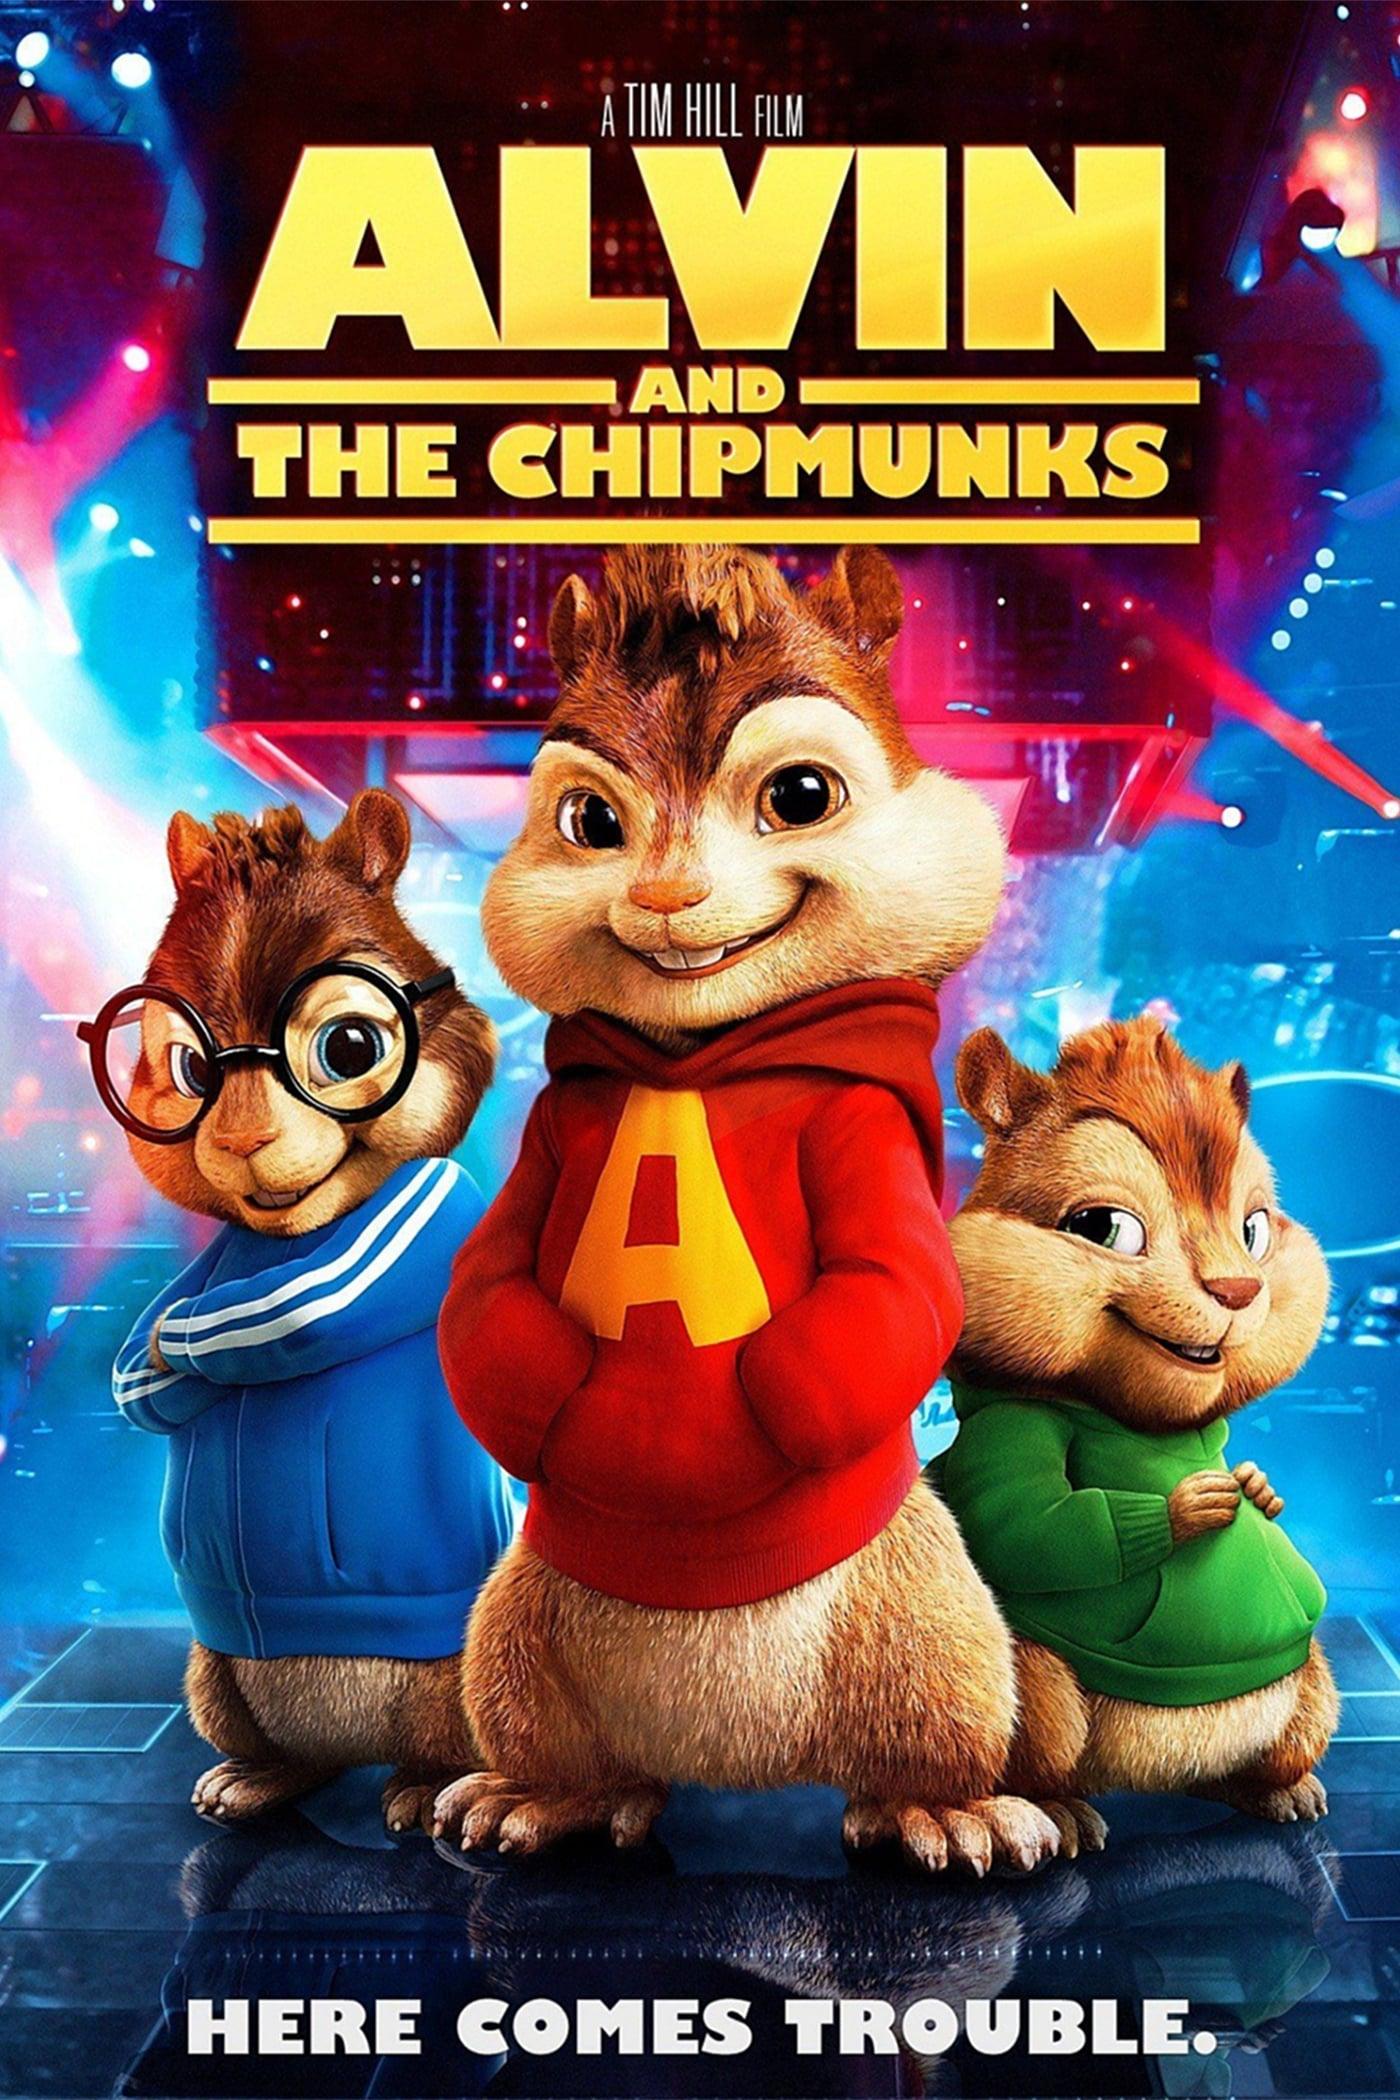 alvin and the chipmunks 2007 � moviesfilmcinecom